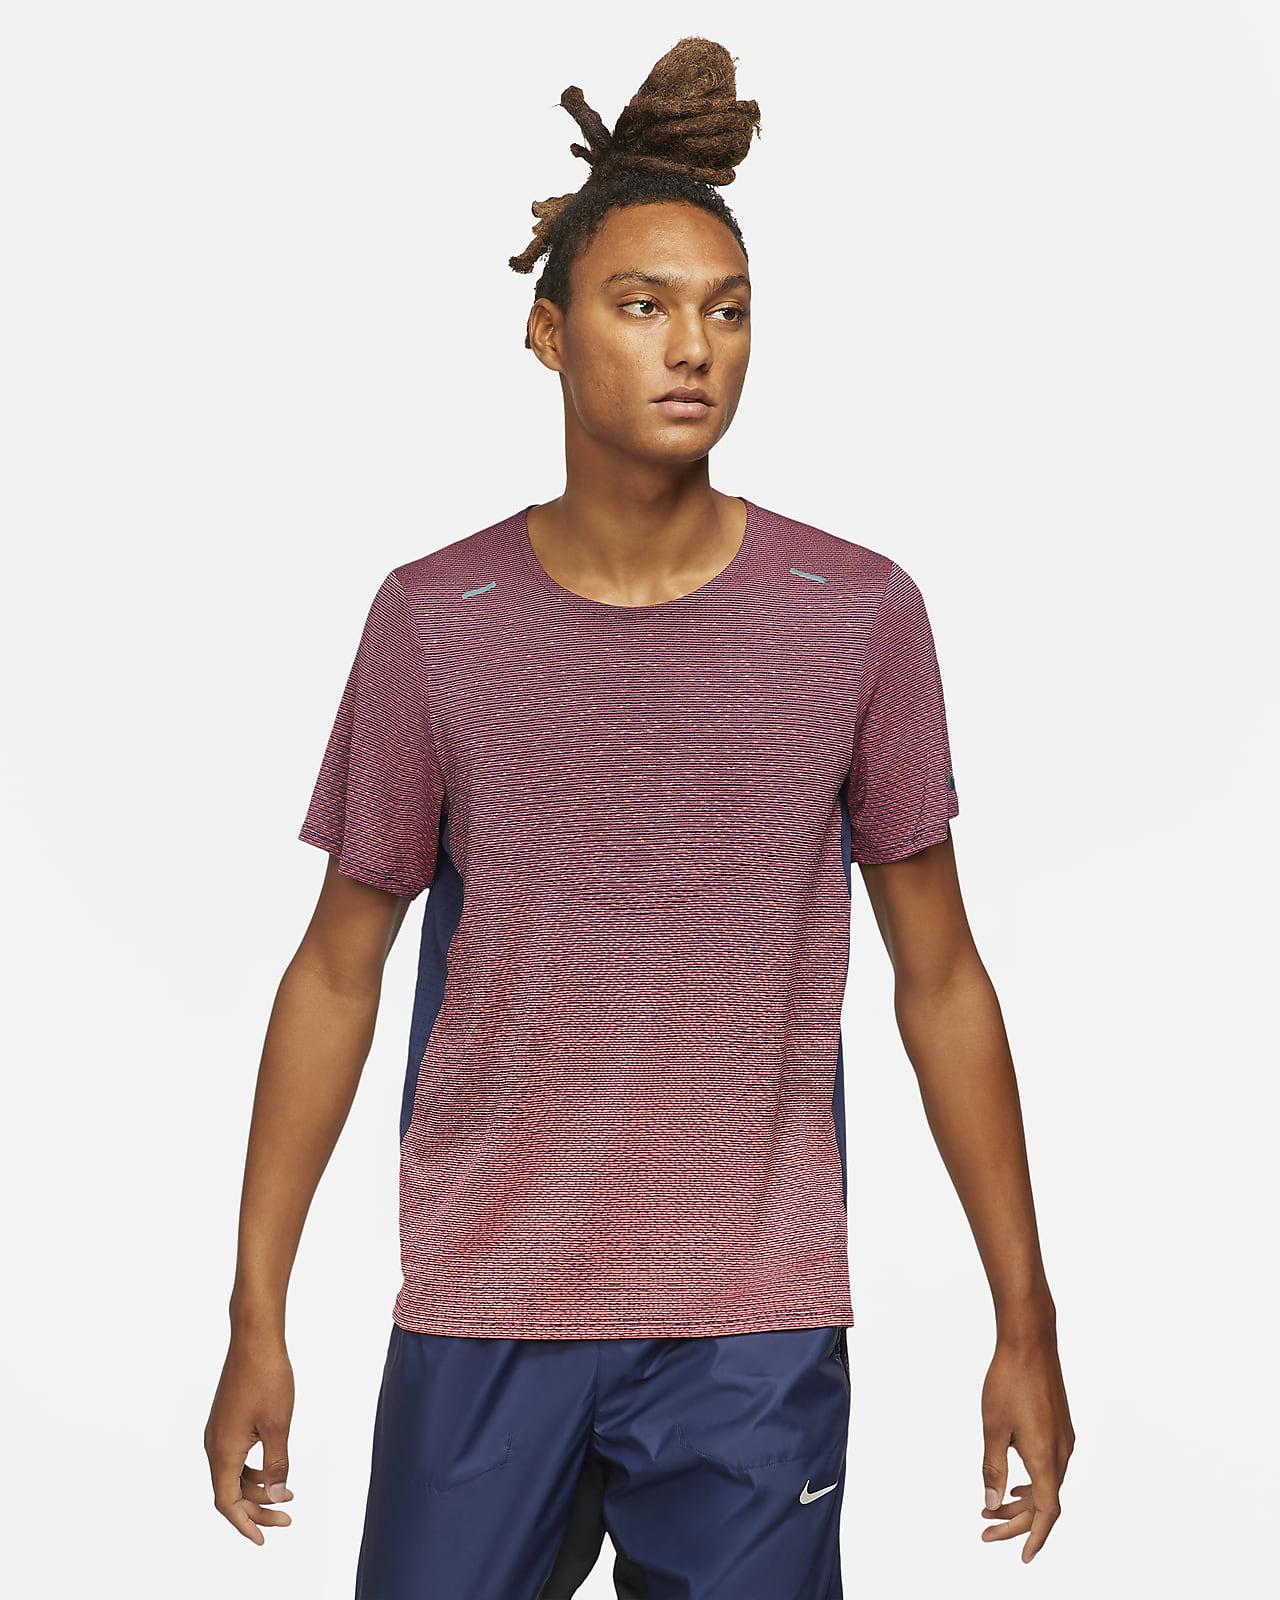 Nike Pinnacle Run Division rövid ujjú férfi futófelső